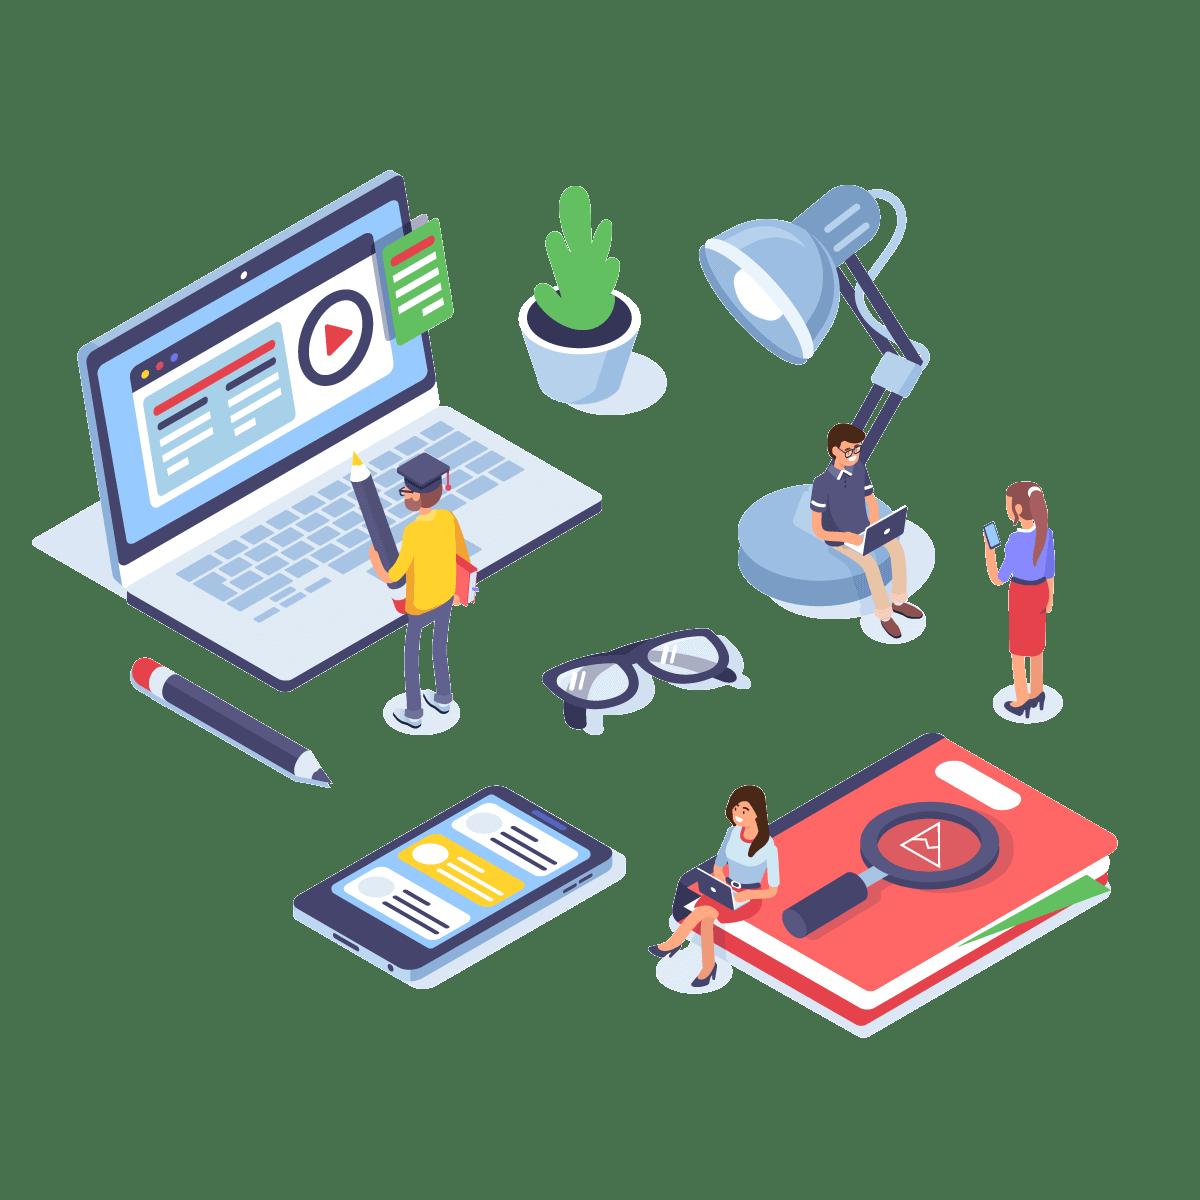 supro creative strategy illustration